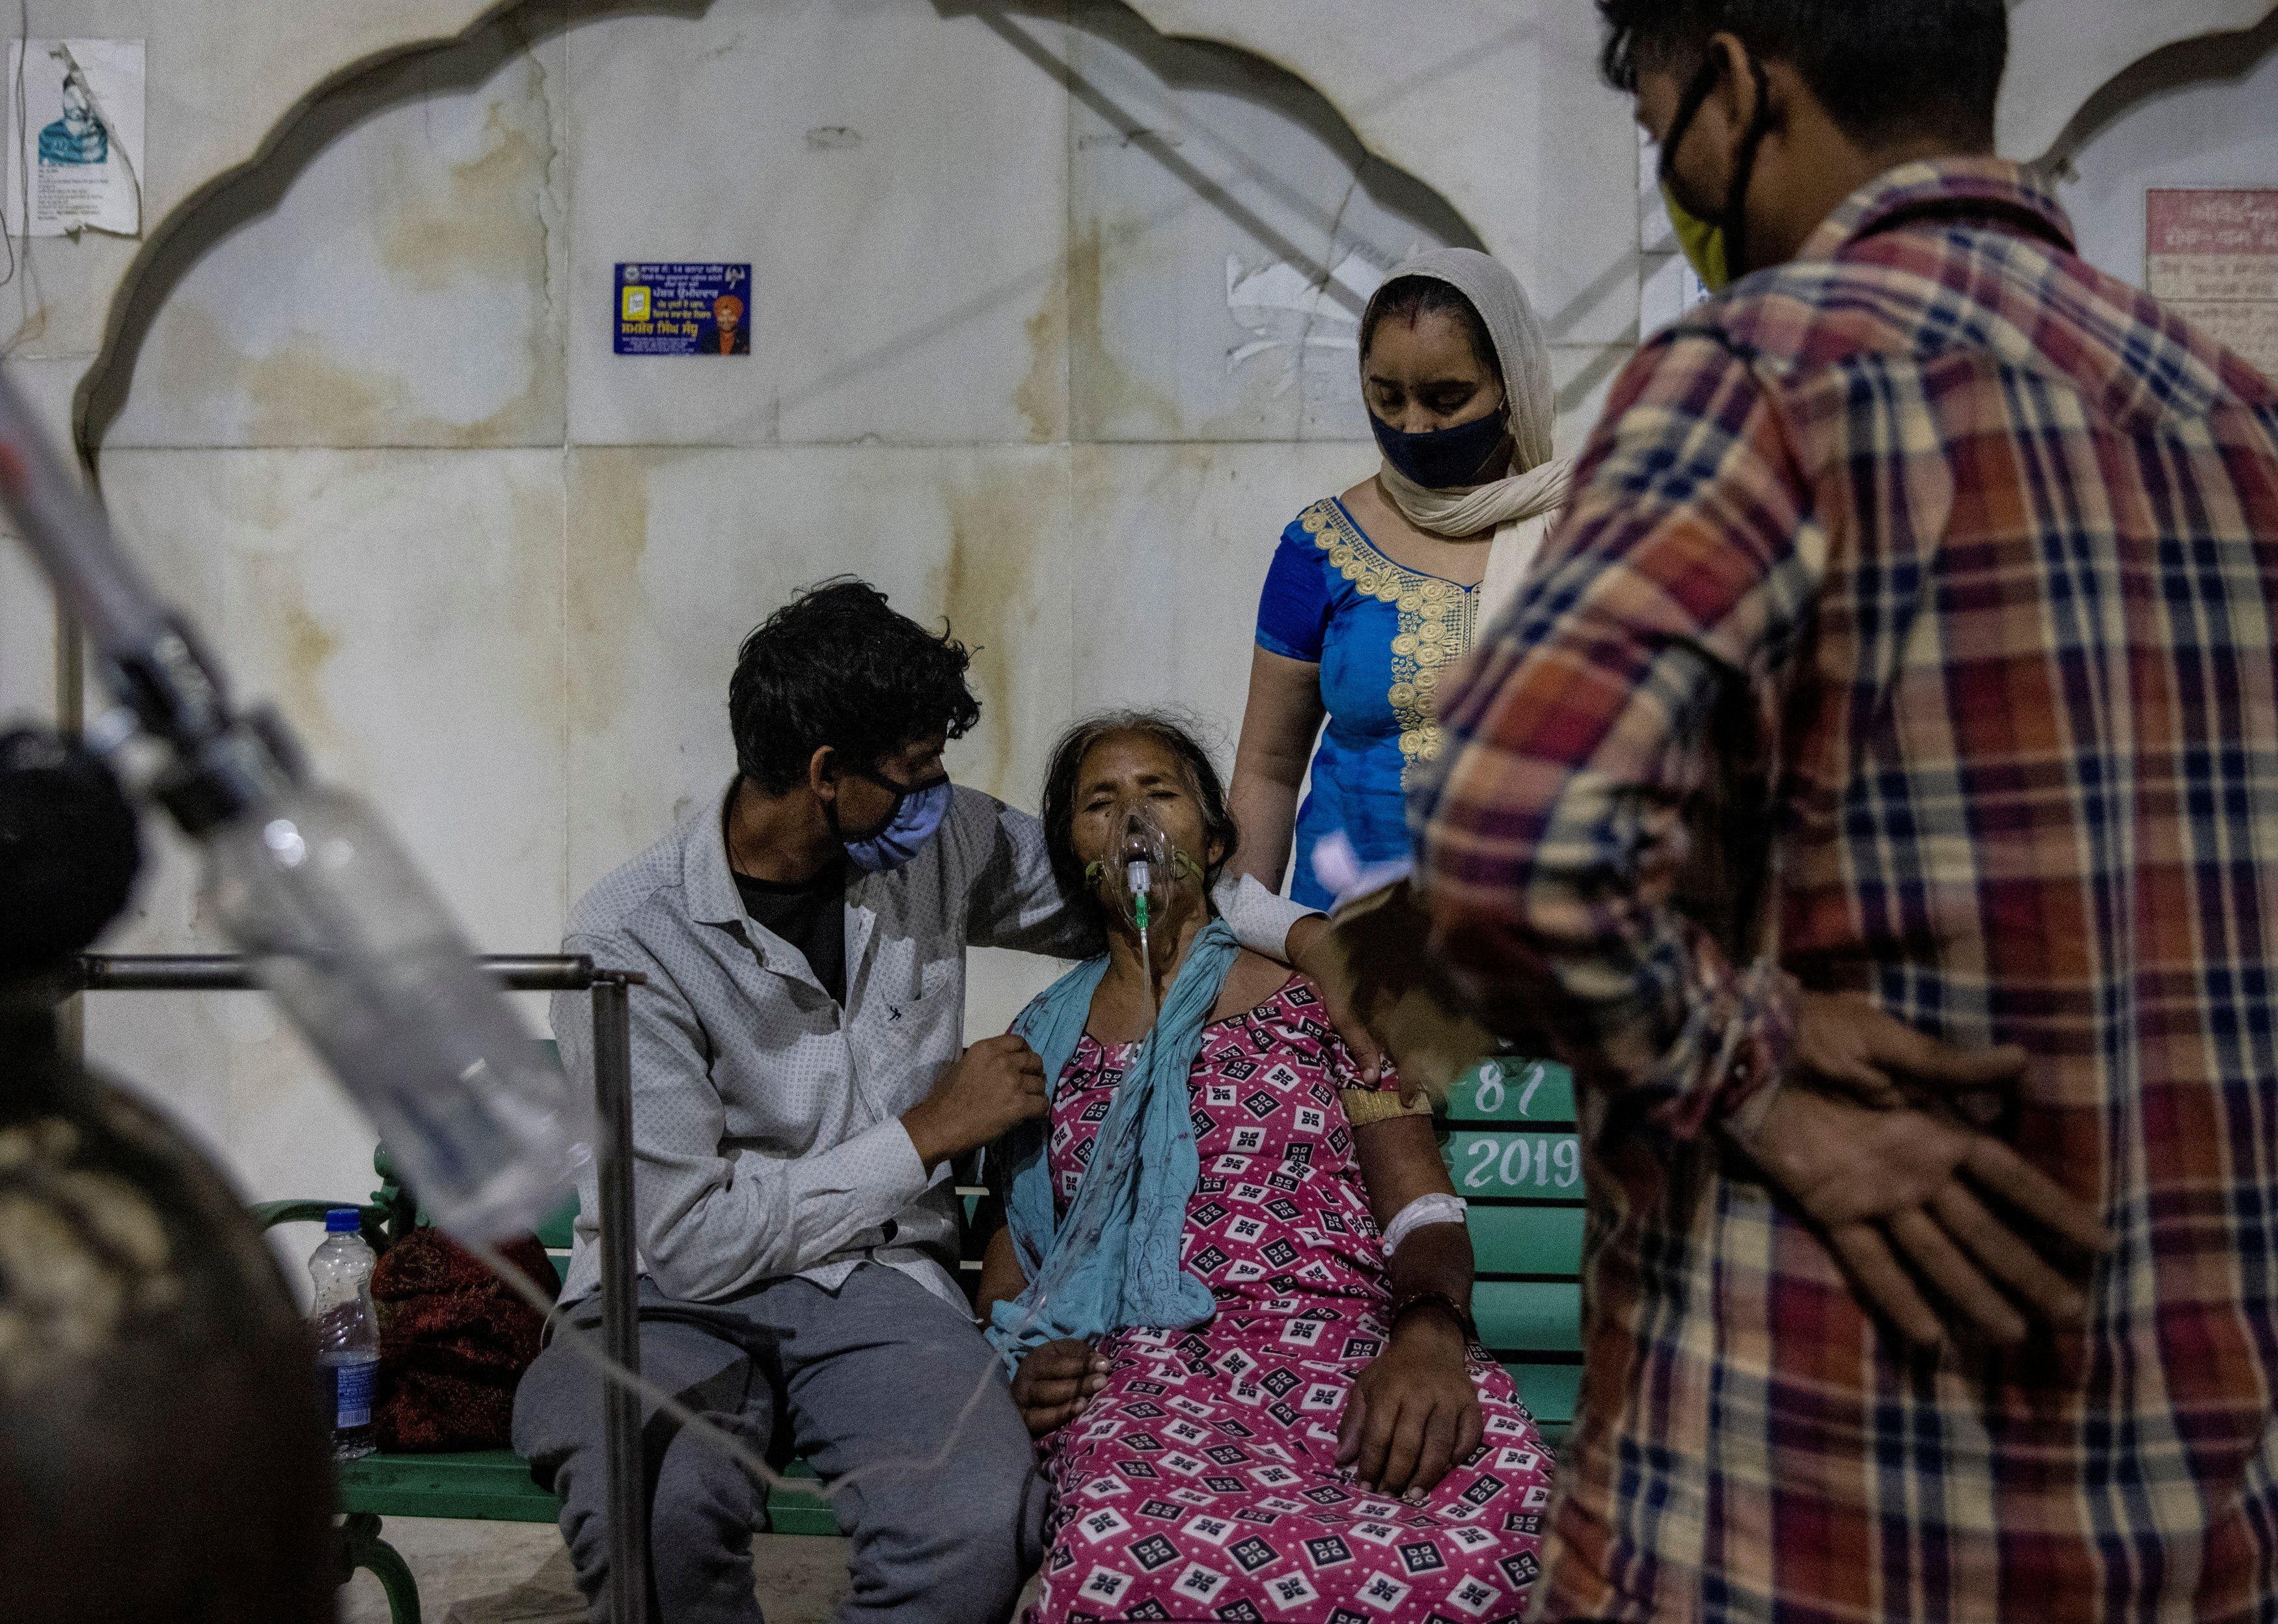 COVID-19,疫情,印度,防疫,莫迪,公共衛生,醫療資源,社區傳播